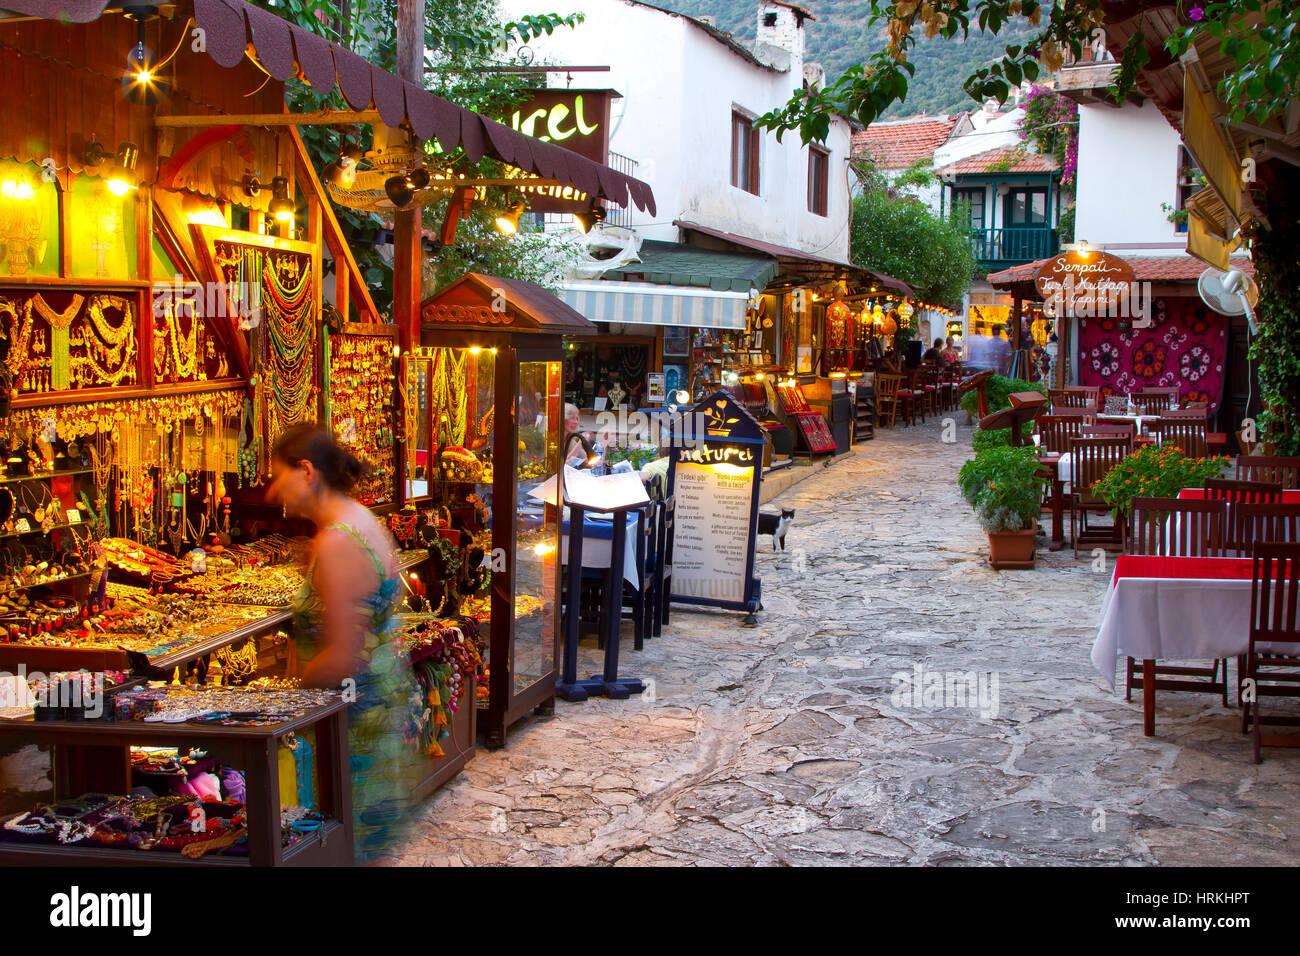 Street view. Kas. Antalya province, mediterranean coast. Turkey. - Stock Image